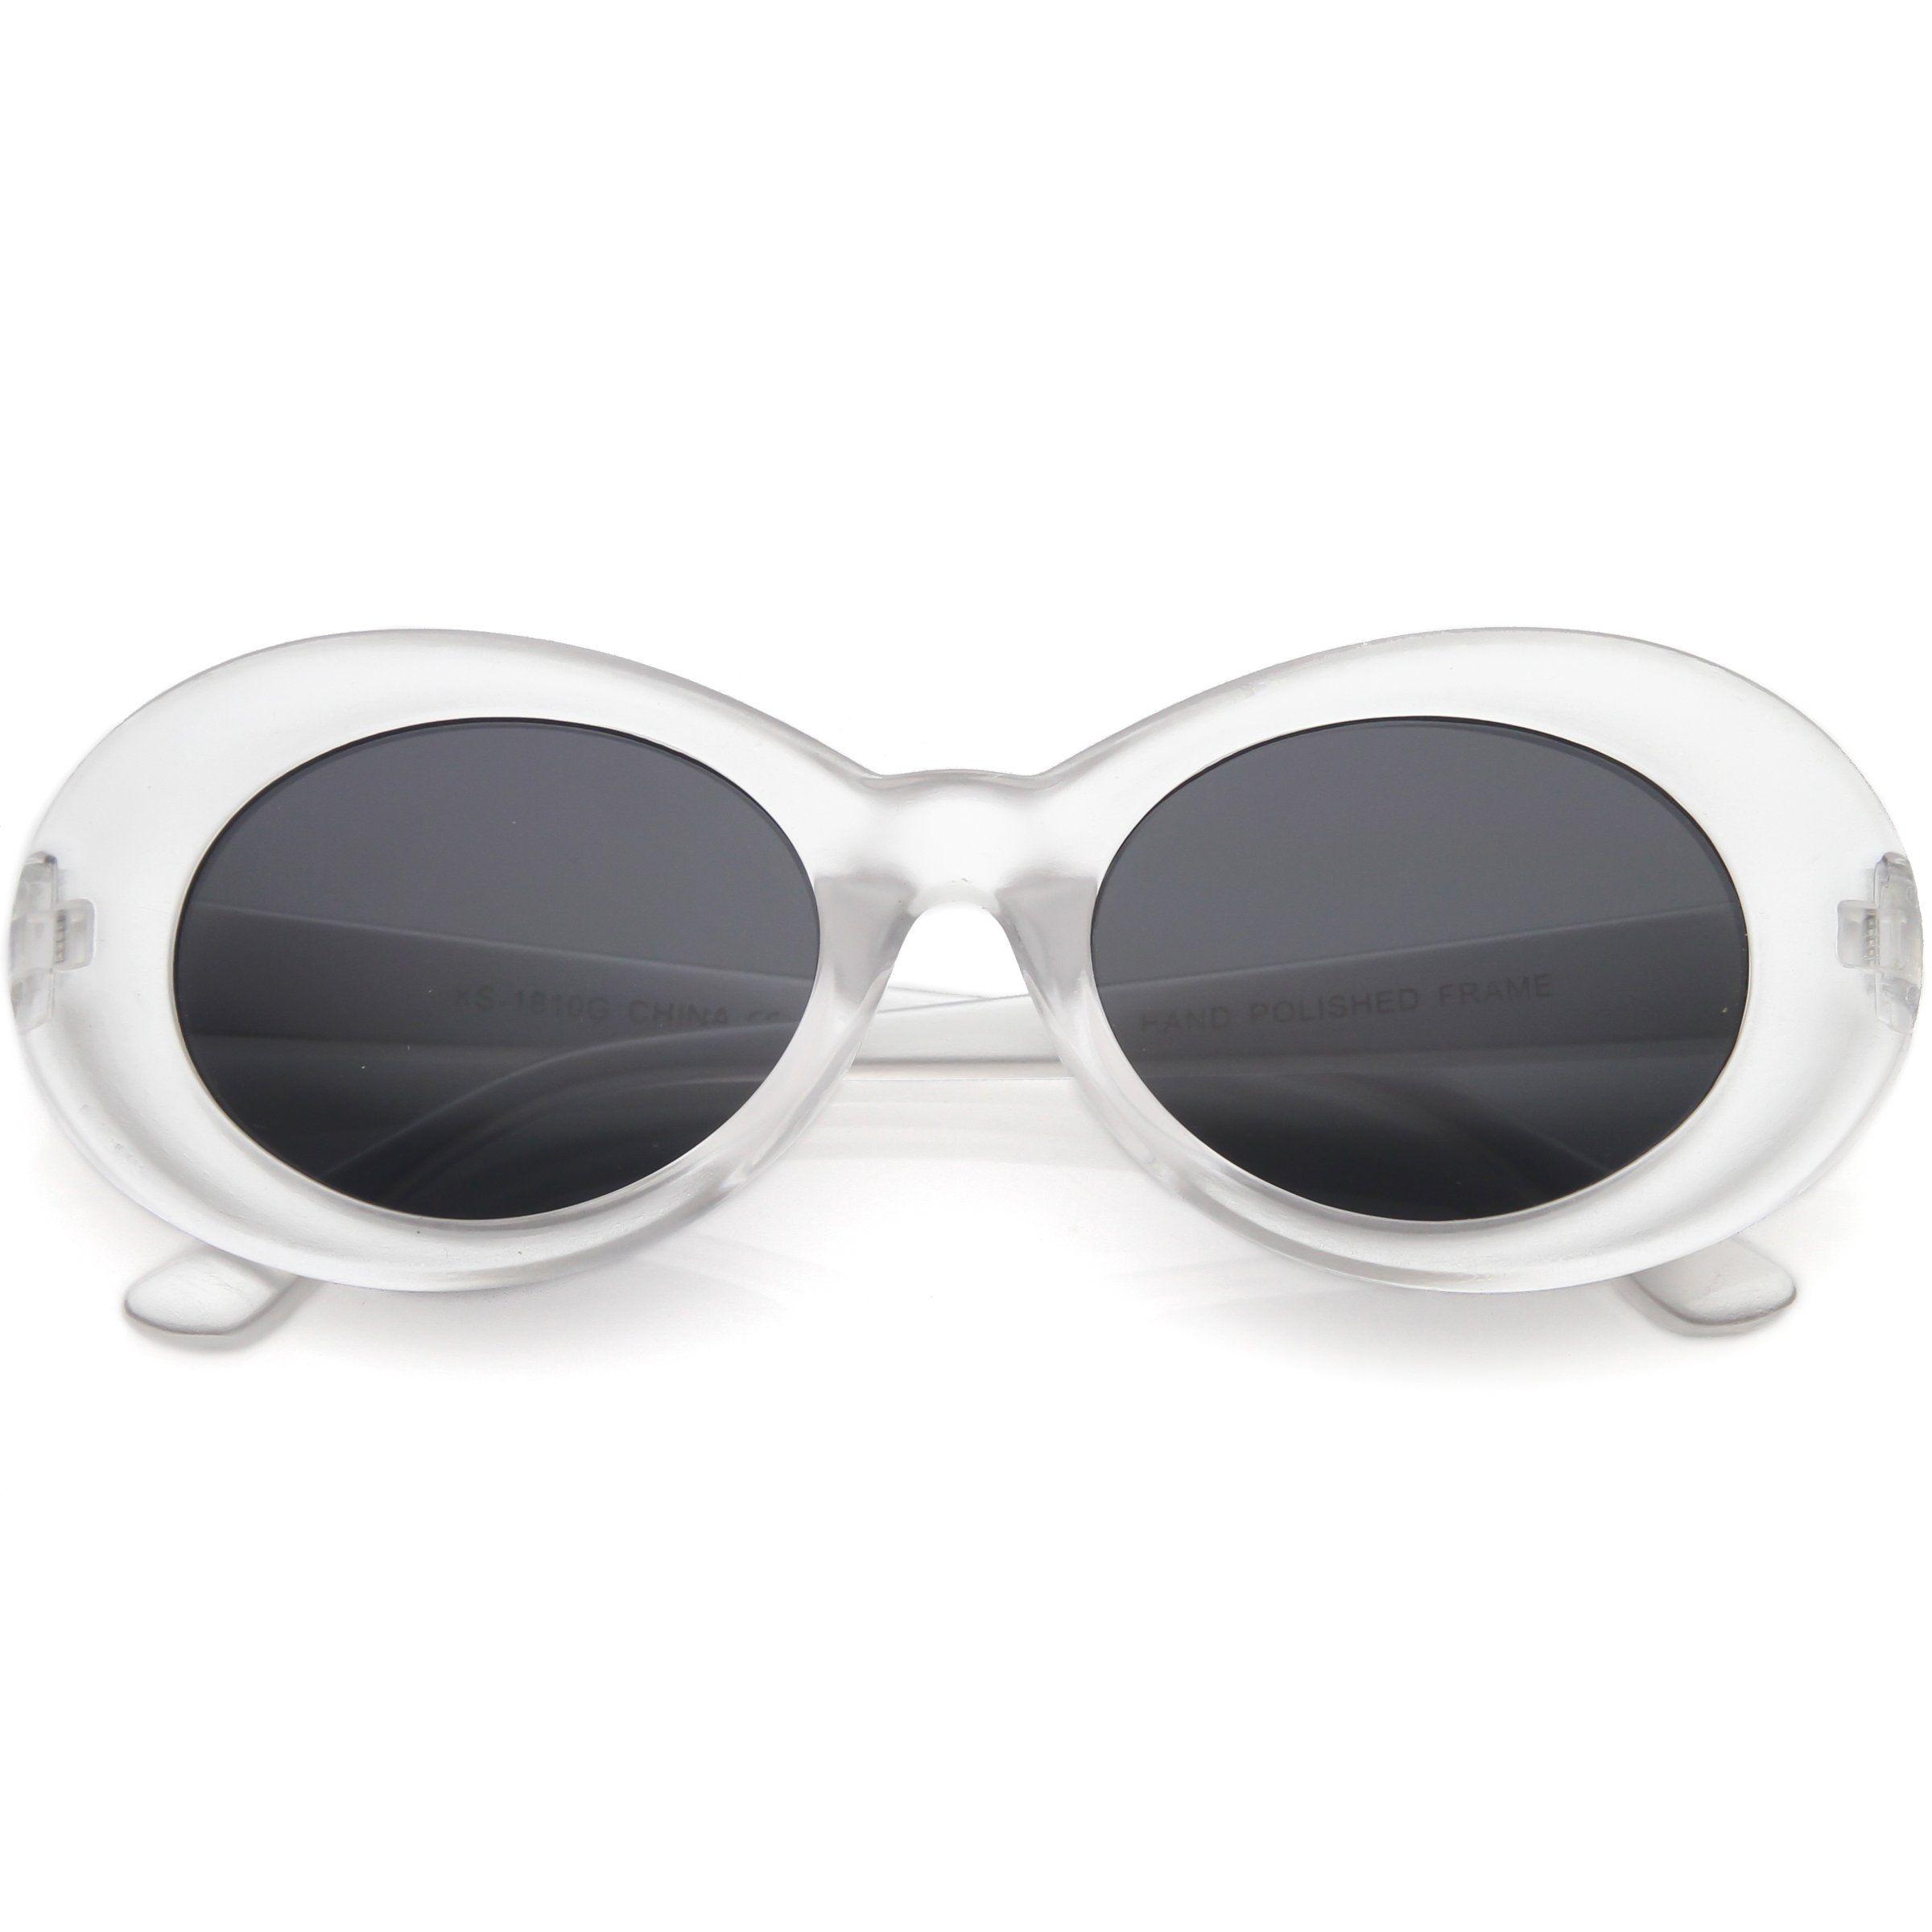 Retro 1990 S Fashion Transparent Thick Clout Goggle Oval Sunglasses C506 In 2020 Oval Sunglasses Glasses Fashion Sunglasses